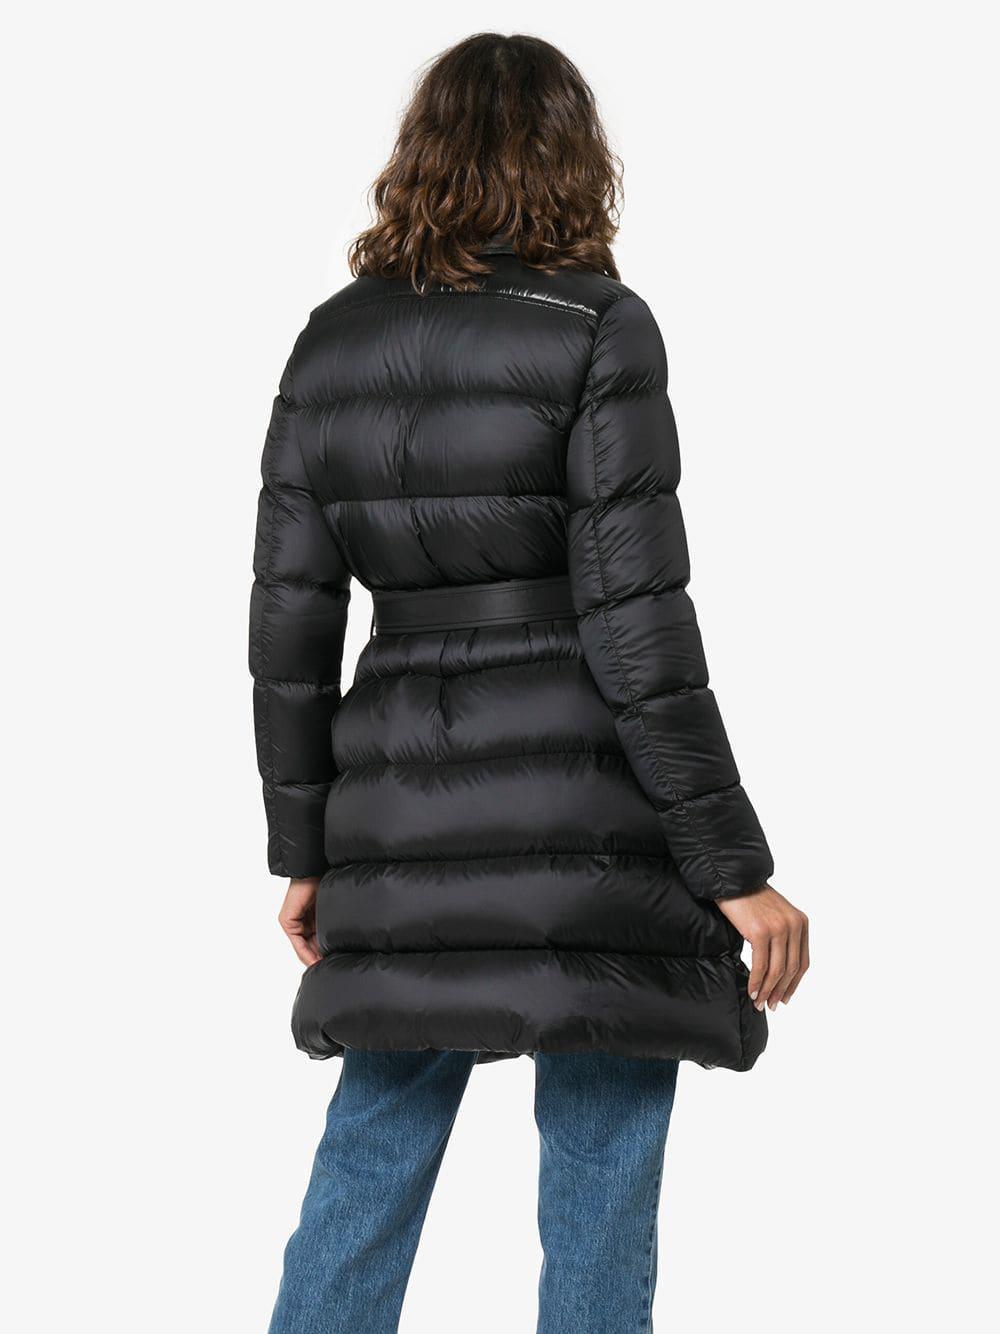 645be836ffdc Lyst - Moncler Gelinotte Belted Coat in Black